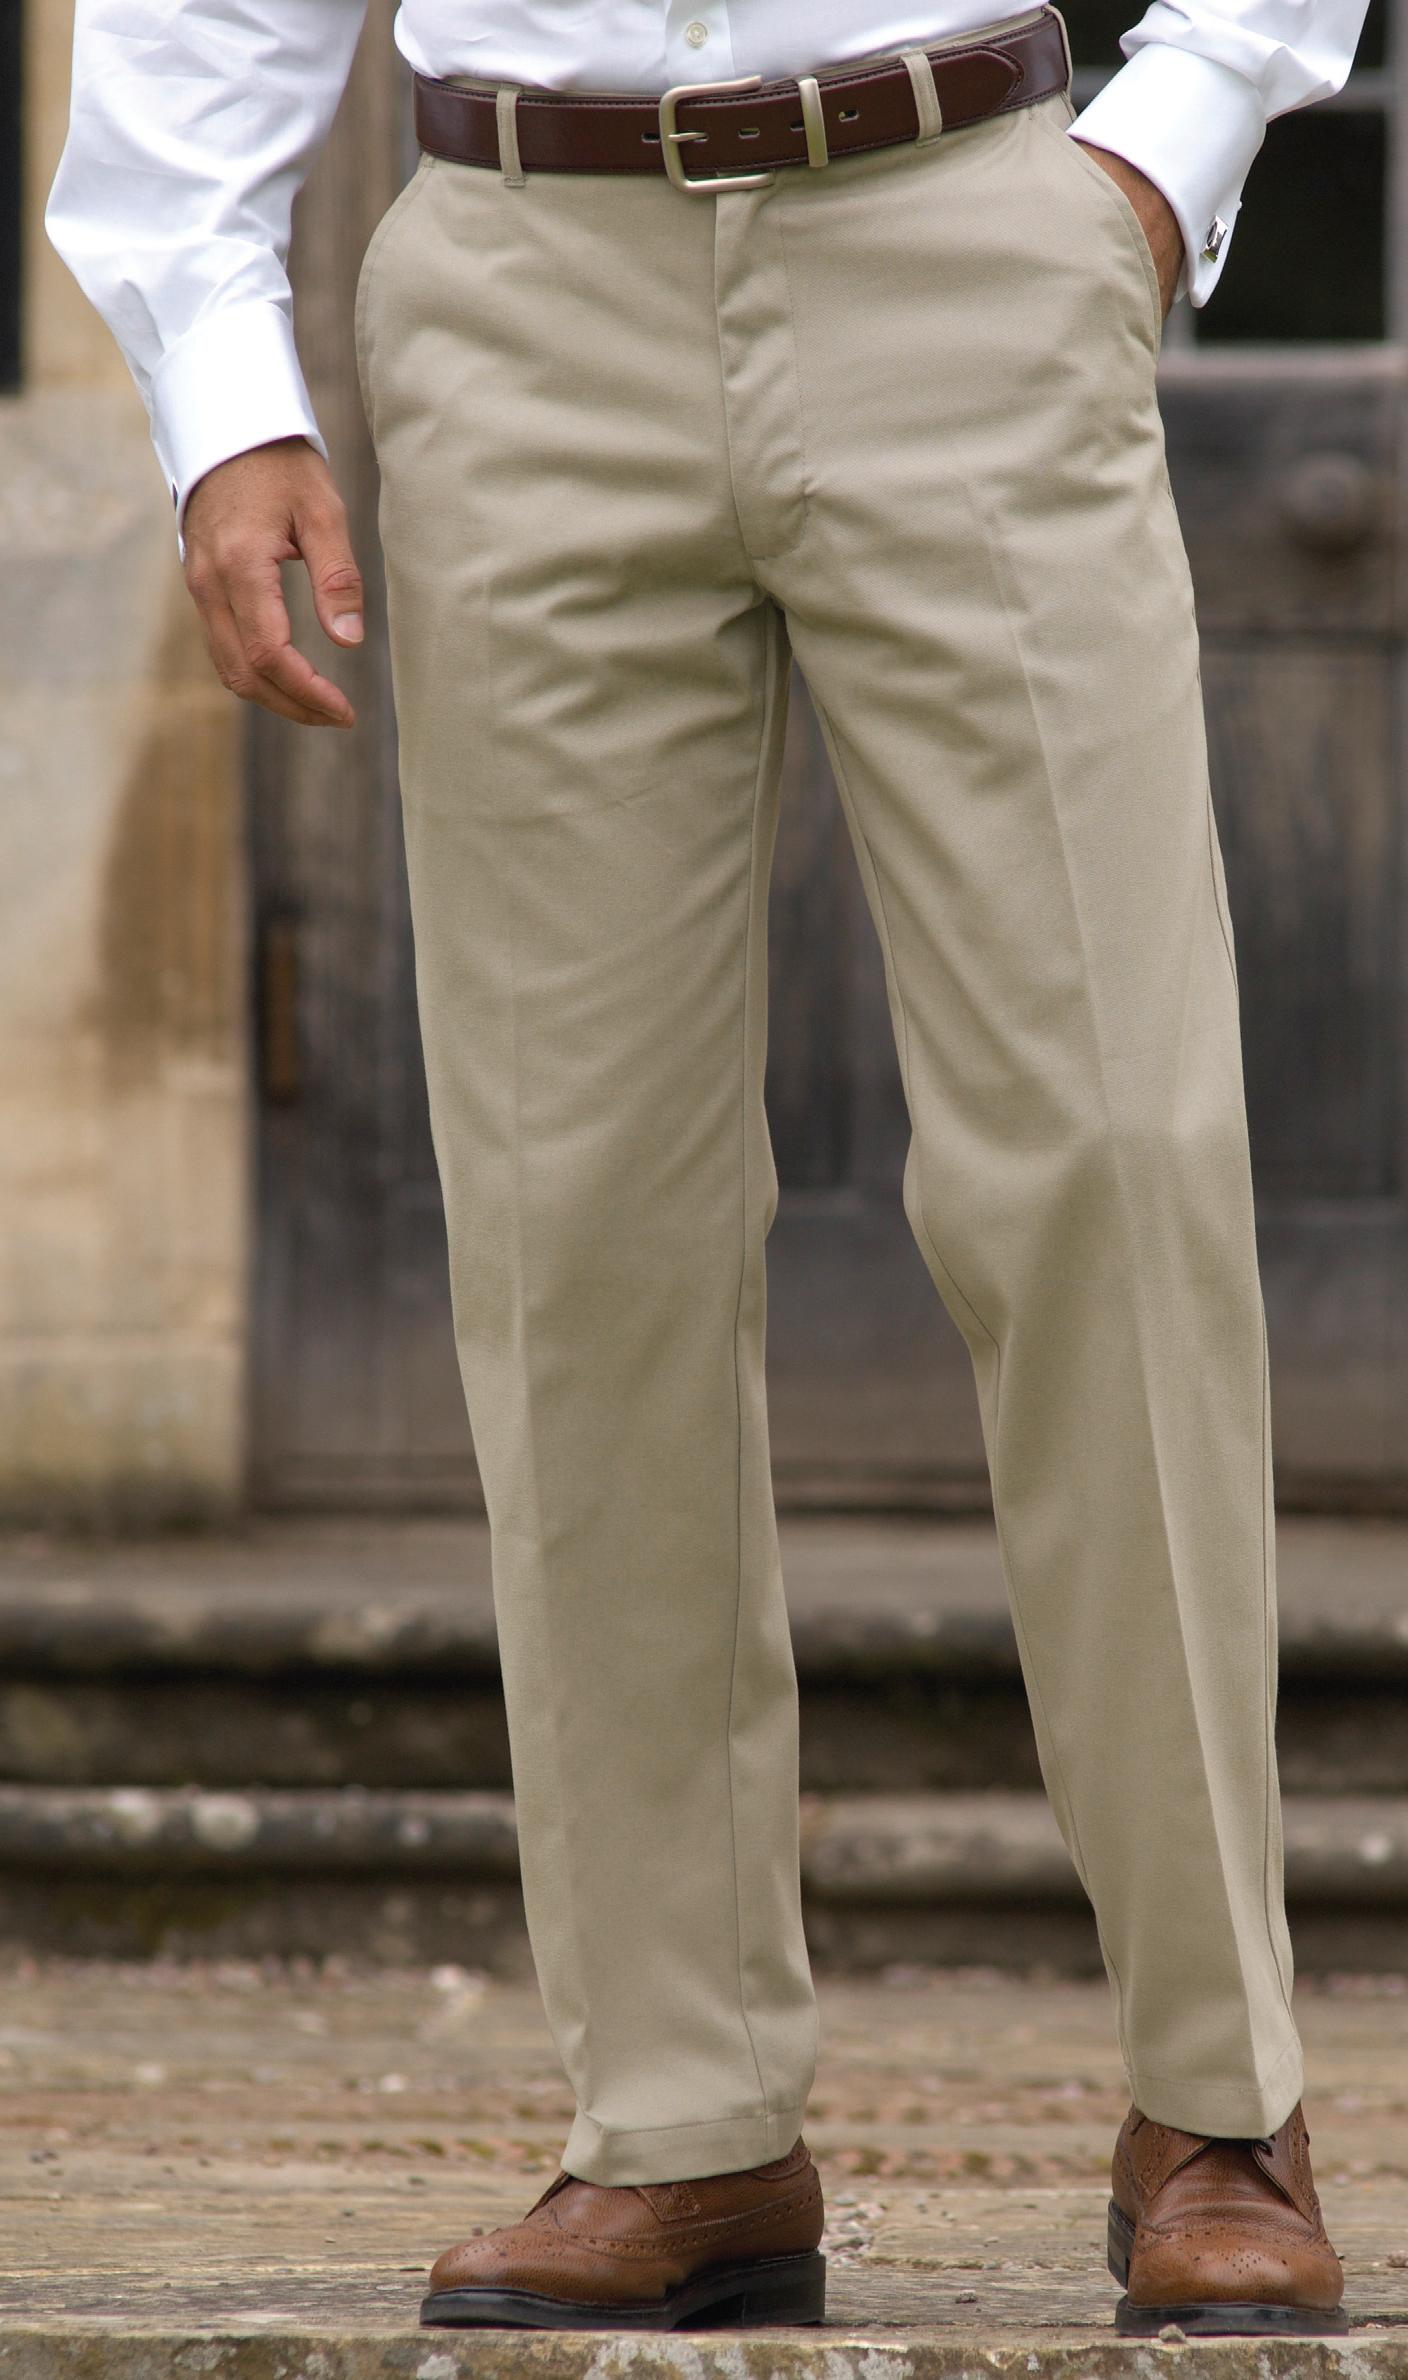 porter ceinture homme